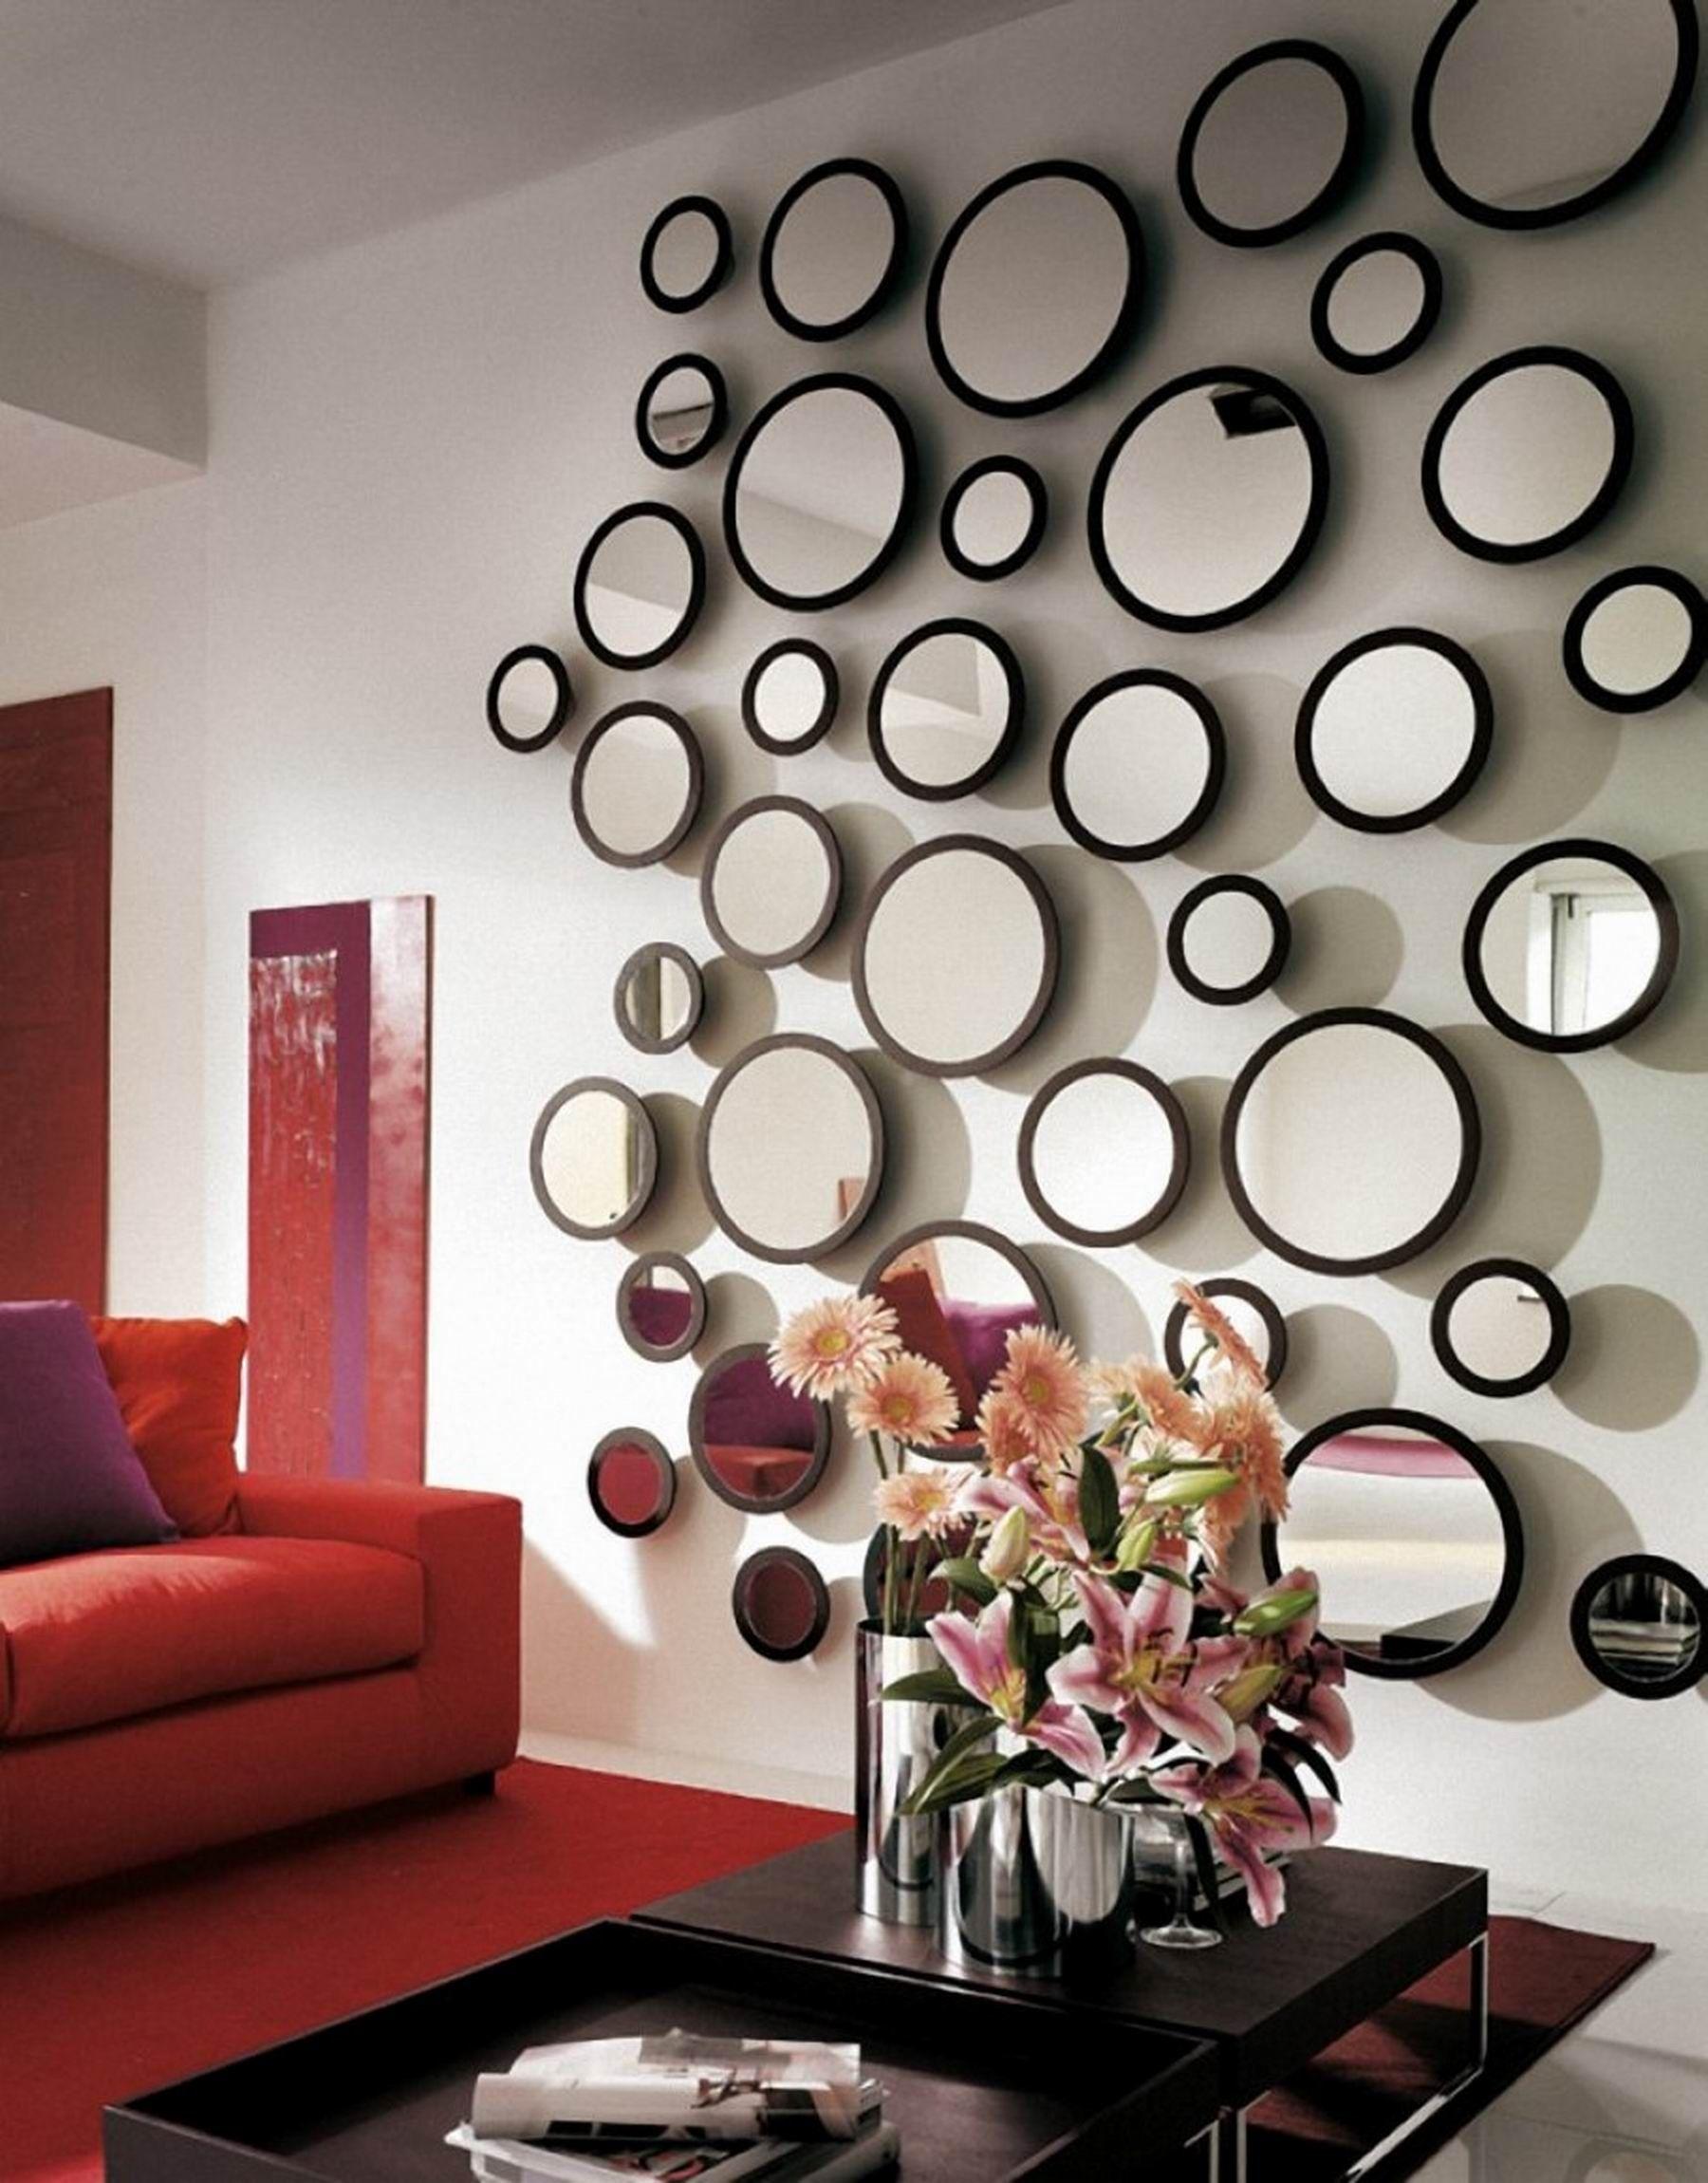 Mirror wall decor ideas for living room drrw pinterest